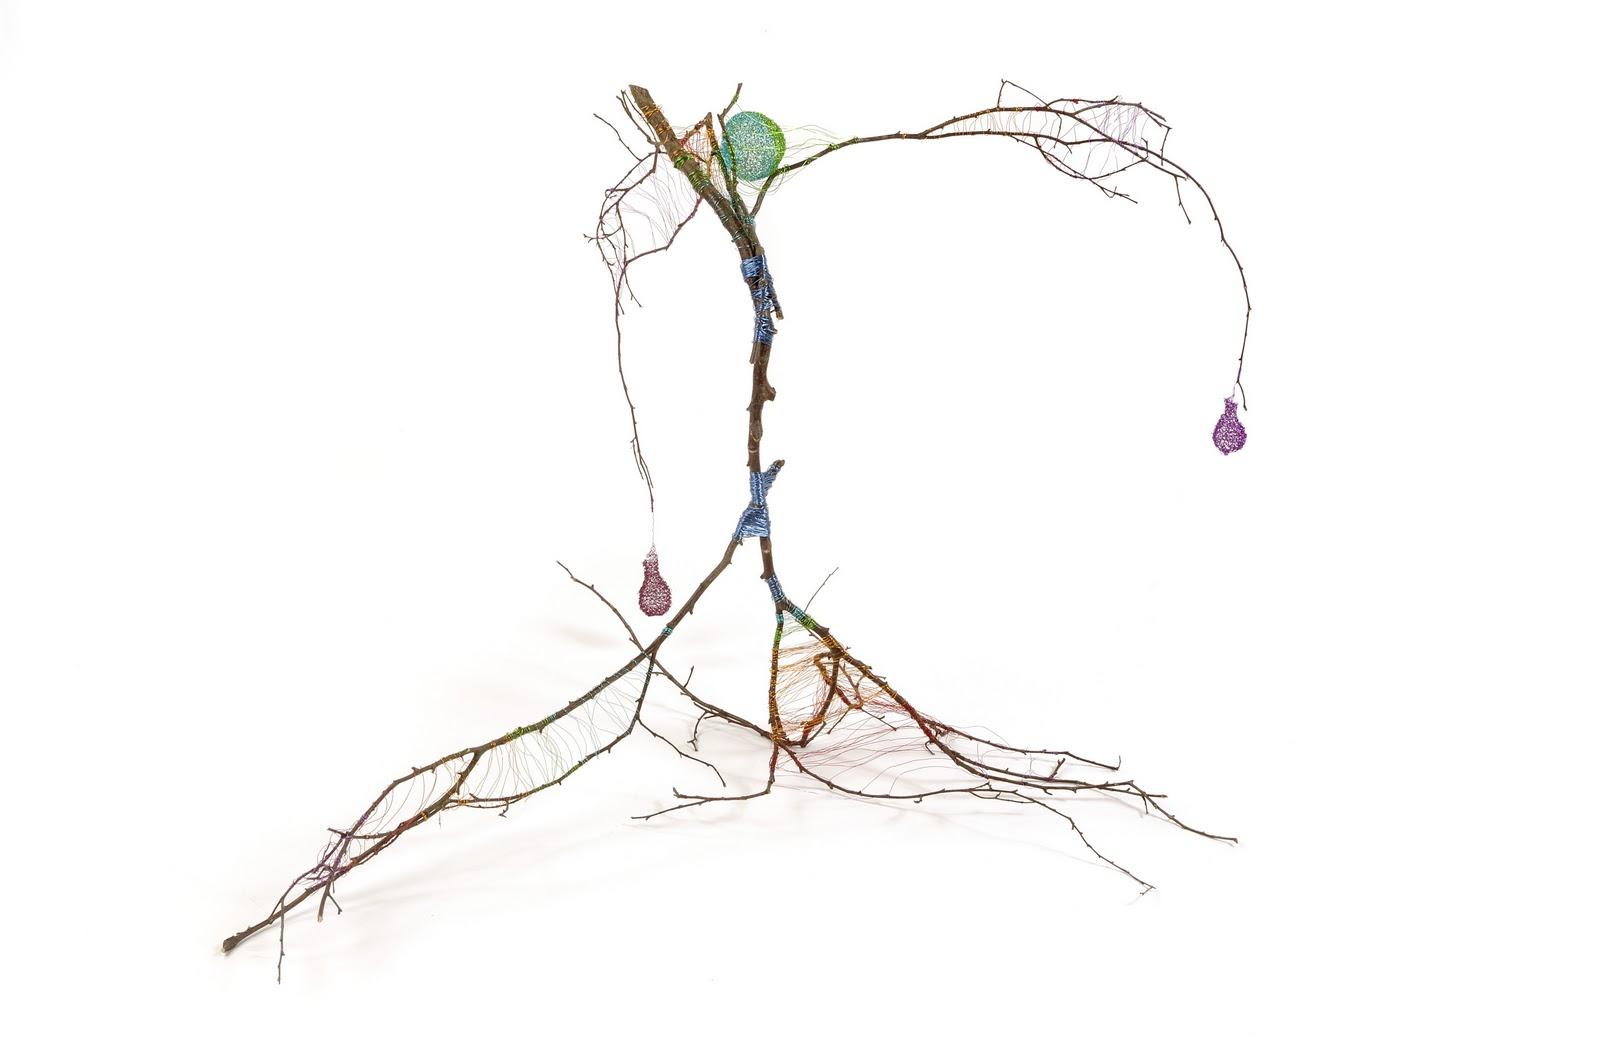 Jane Southgate: Mushrooms, moss and reclaiming work.